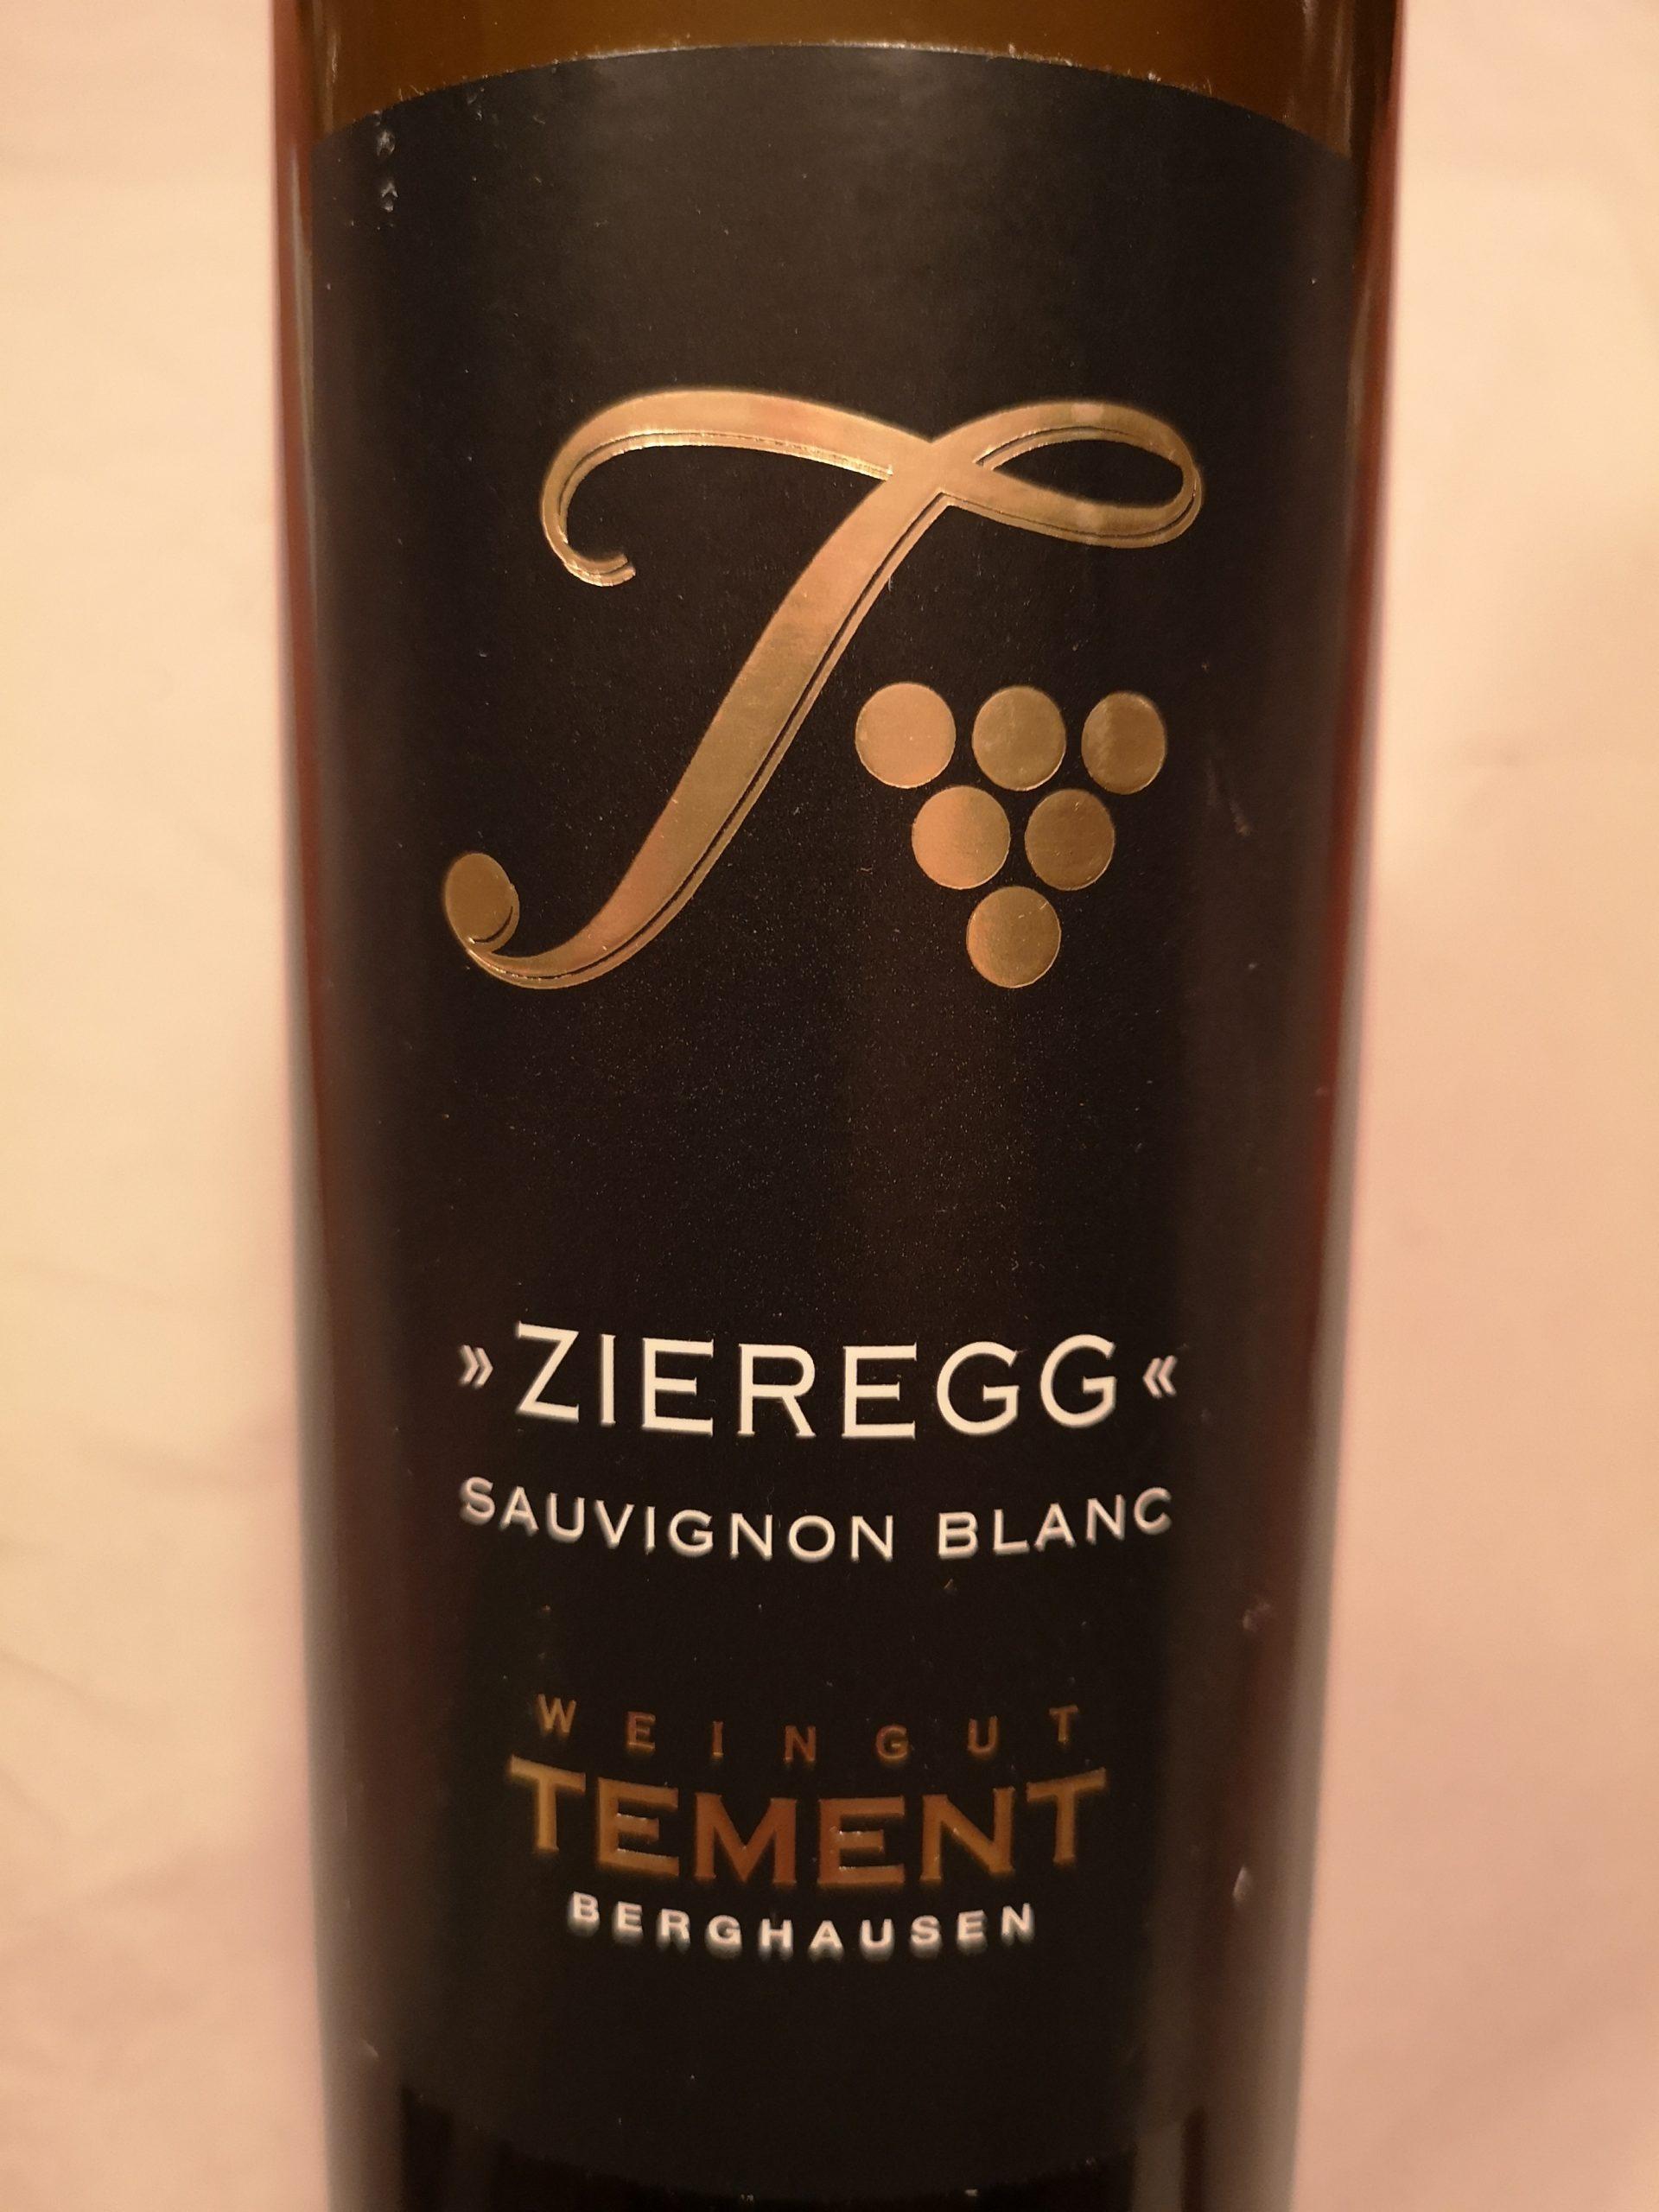 2011 Sauvignon Blanc Zieregg STK | Tement